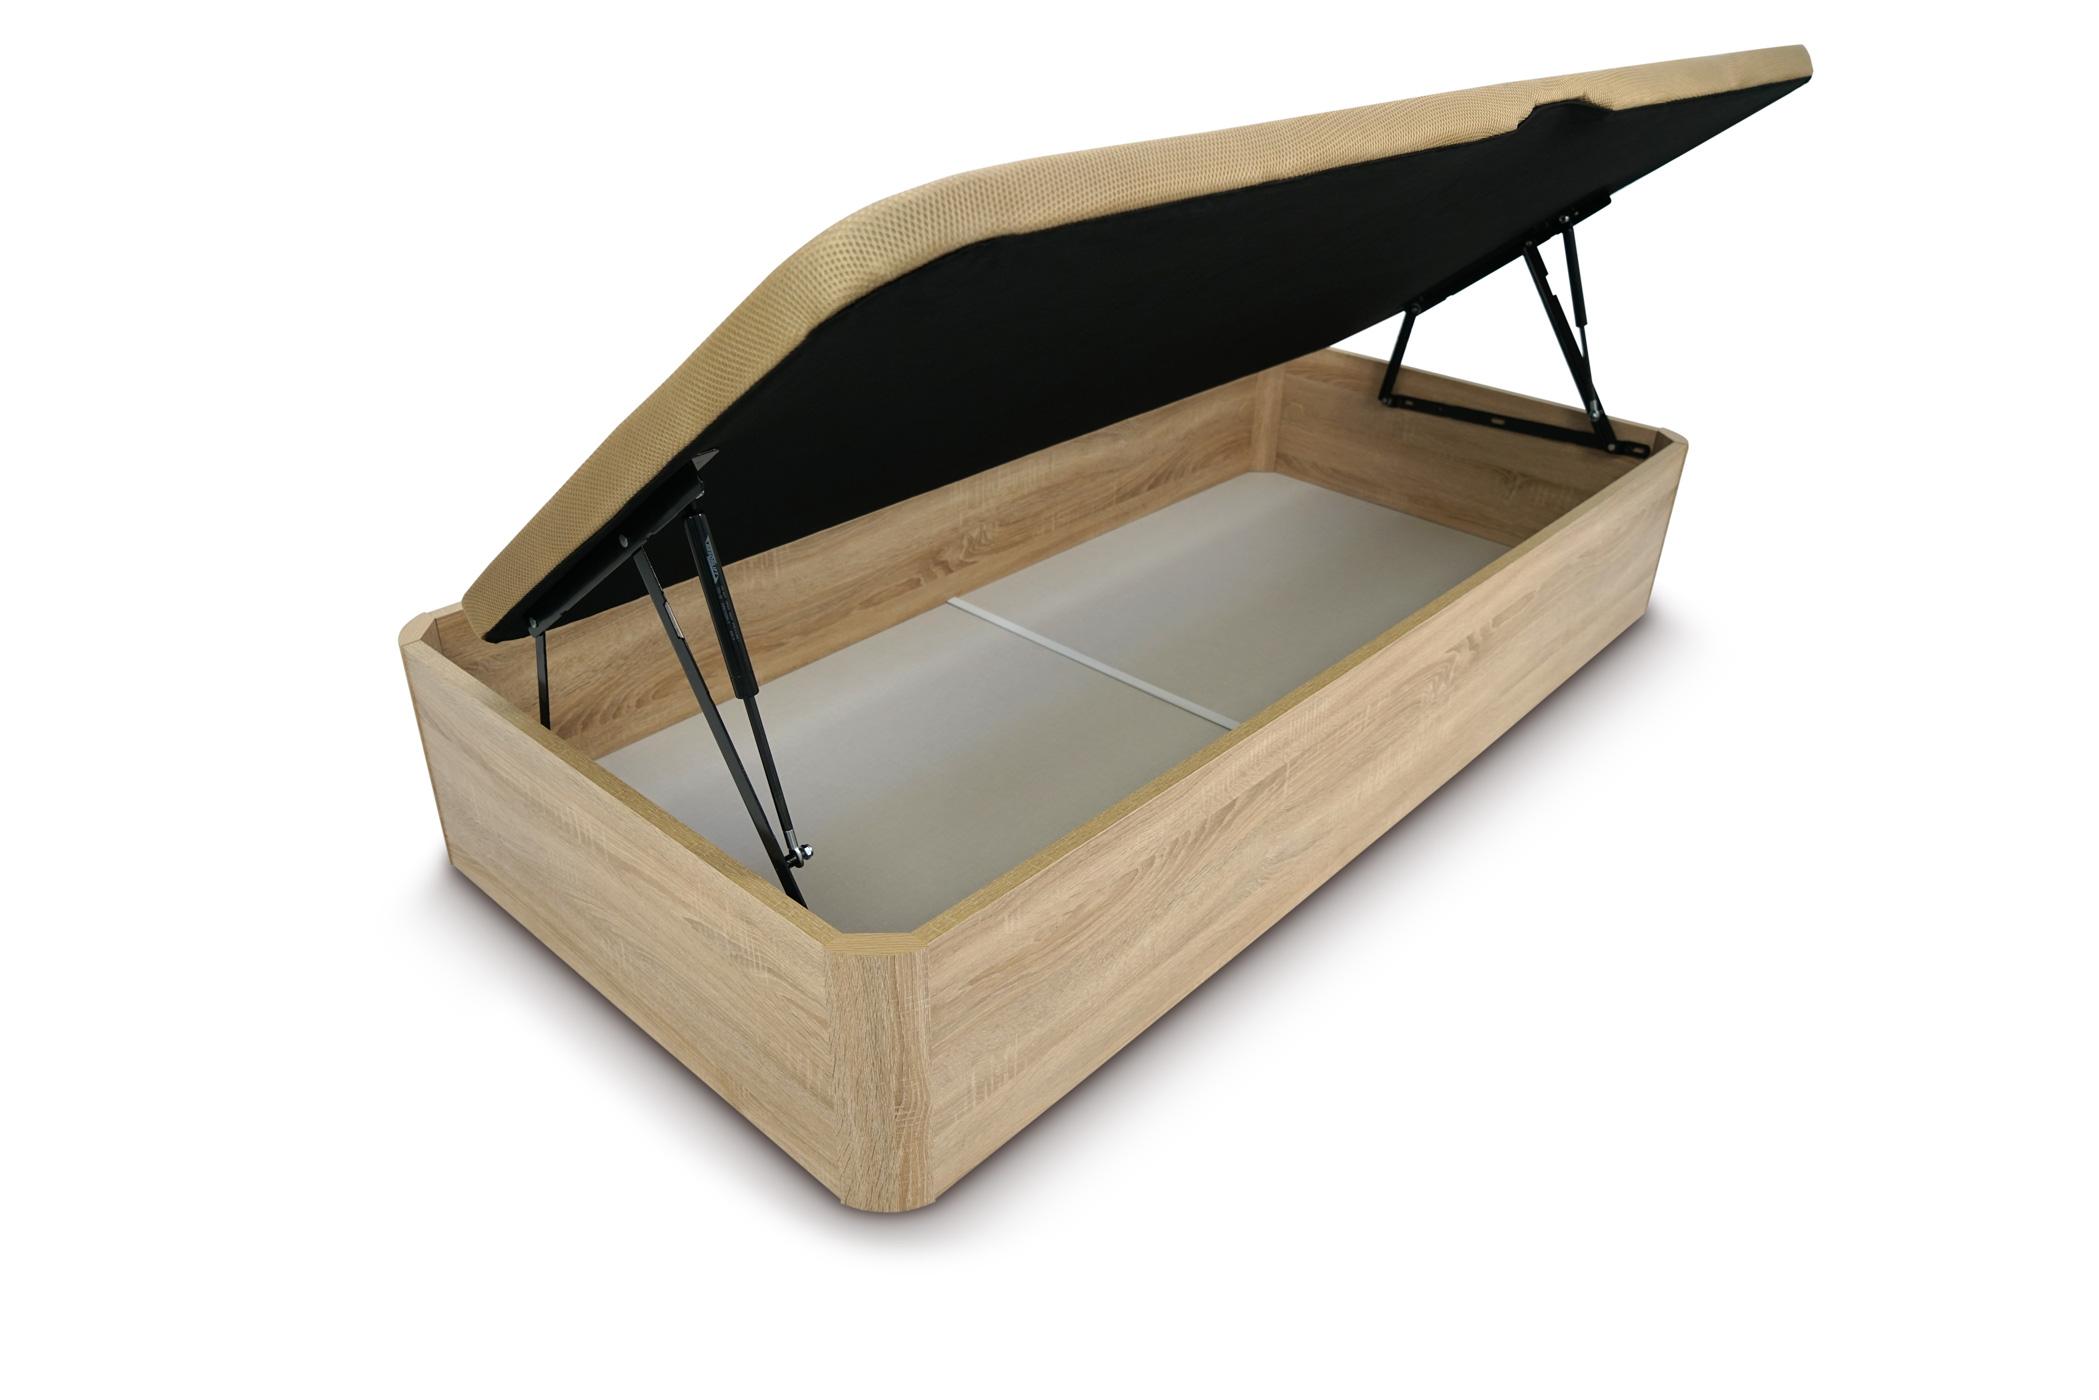 Canapé abatible lateral de madera gran capacidad